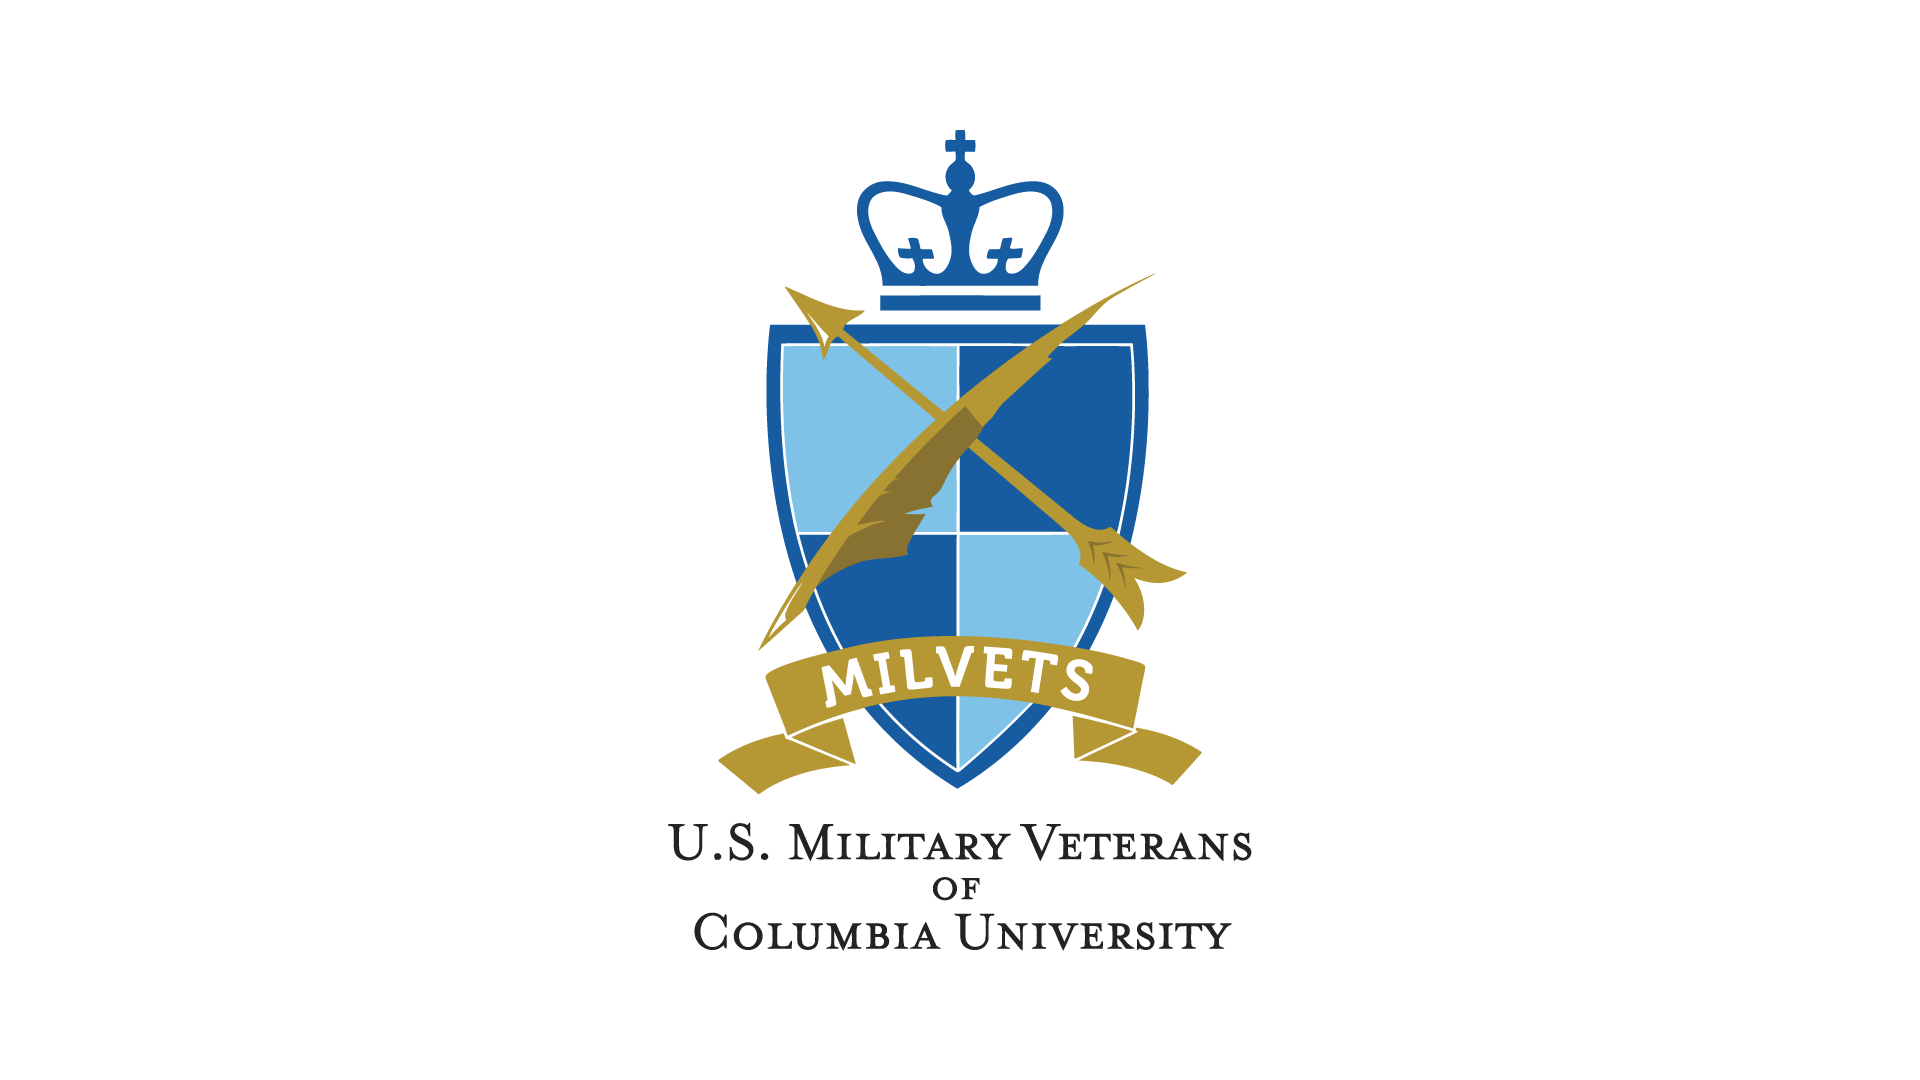 Us military veterans of columbia university ring the nyse opening us military veterans of columbia university ring the nyse opening bell biocorpaavc